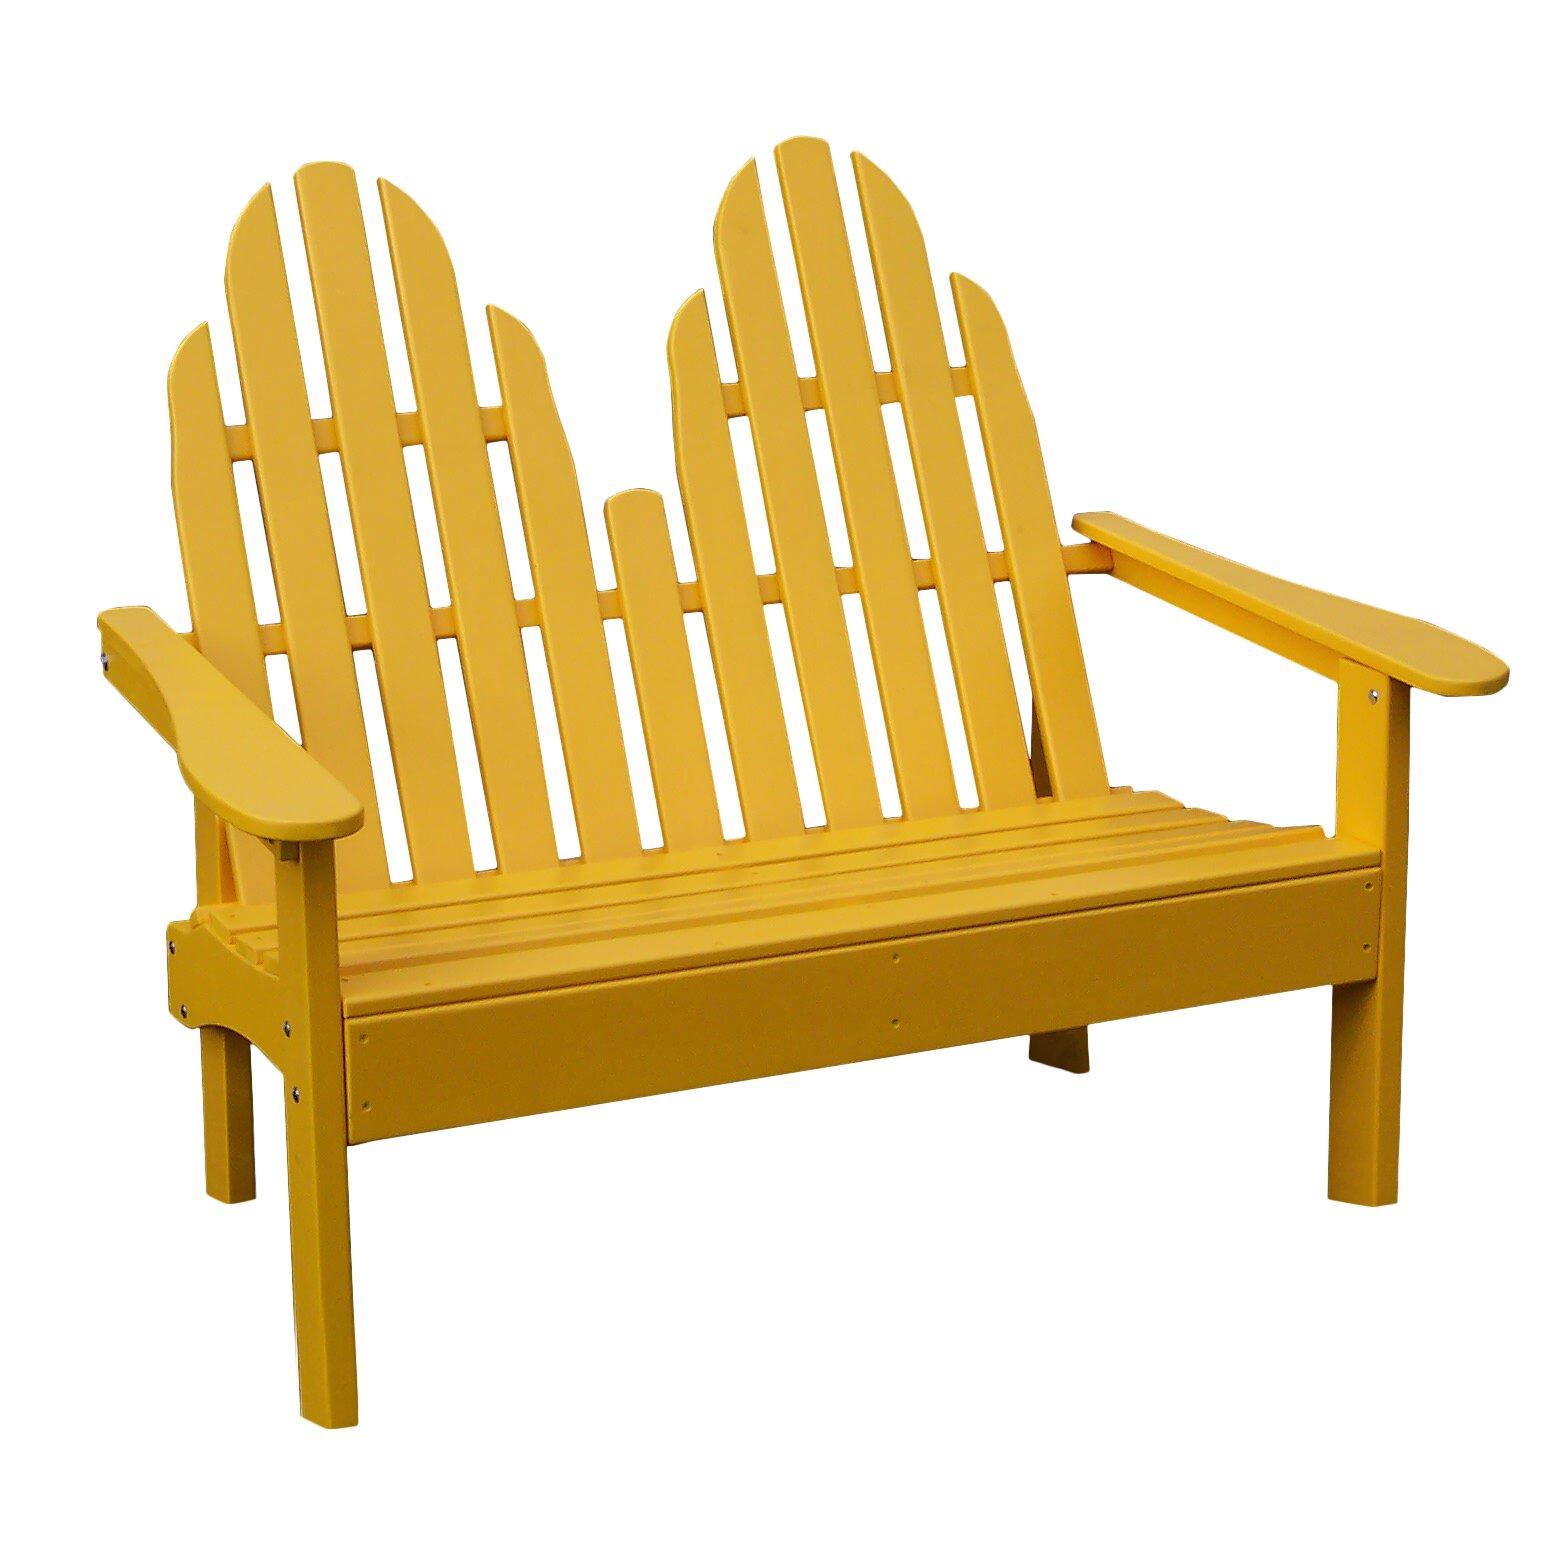 Prairie Leisure Design Adirondack Wood Garden Bench Reviews Wayfair